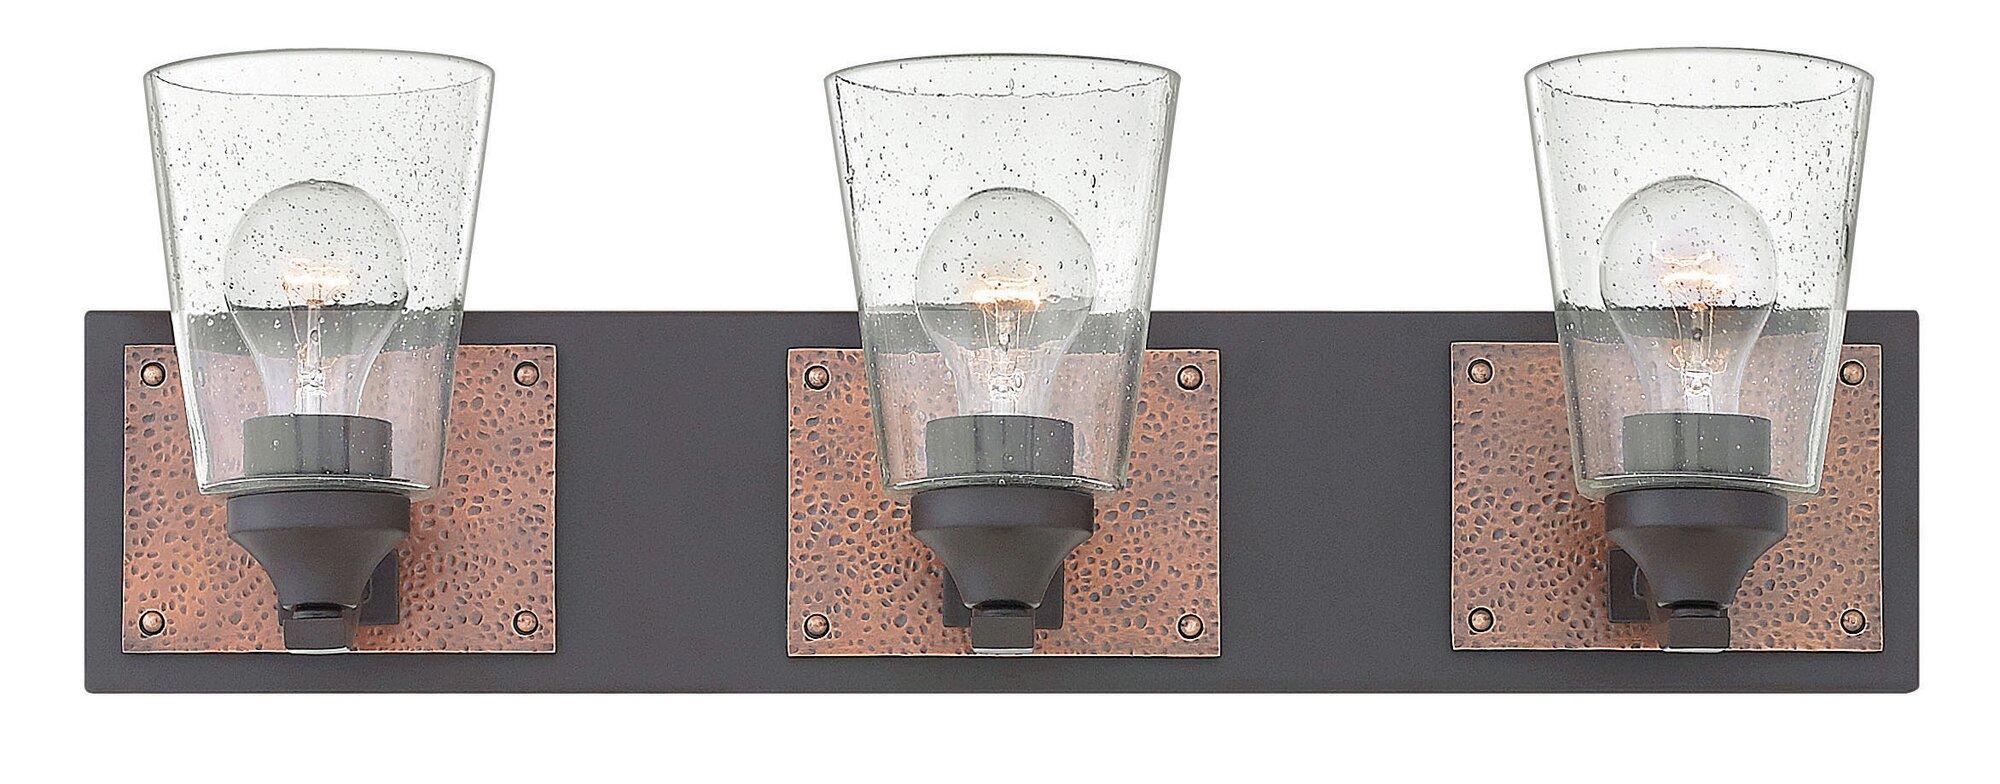 New 3 Light Bathroom Vanity Lighting Fixture Noble Bronze: Hinkley Lighting Jackson 3-Light Vanity Light Buckeye